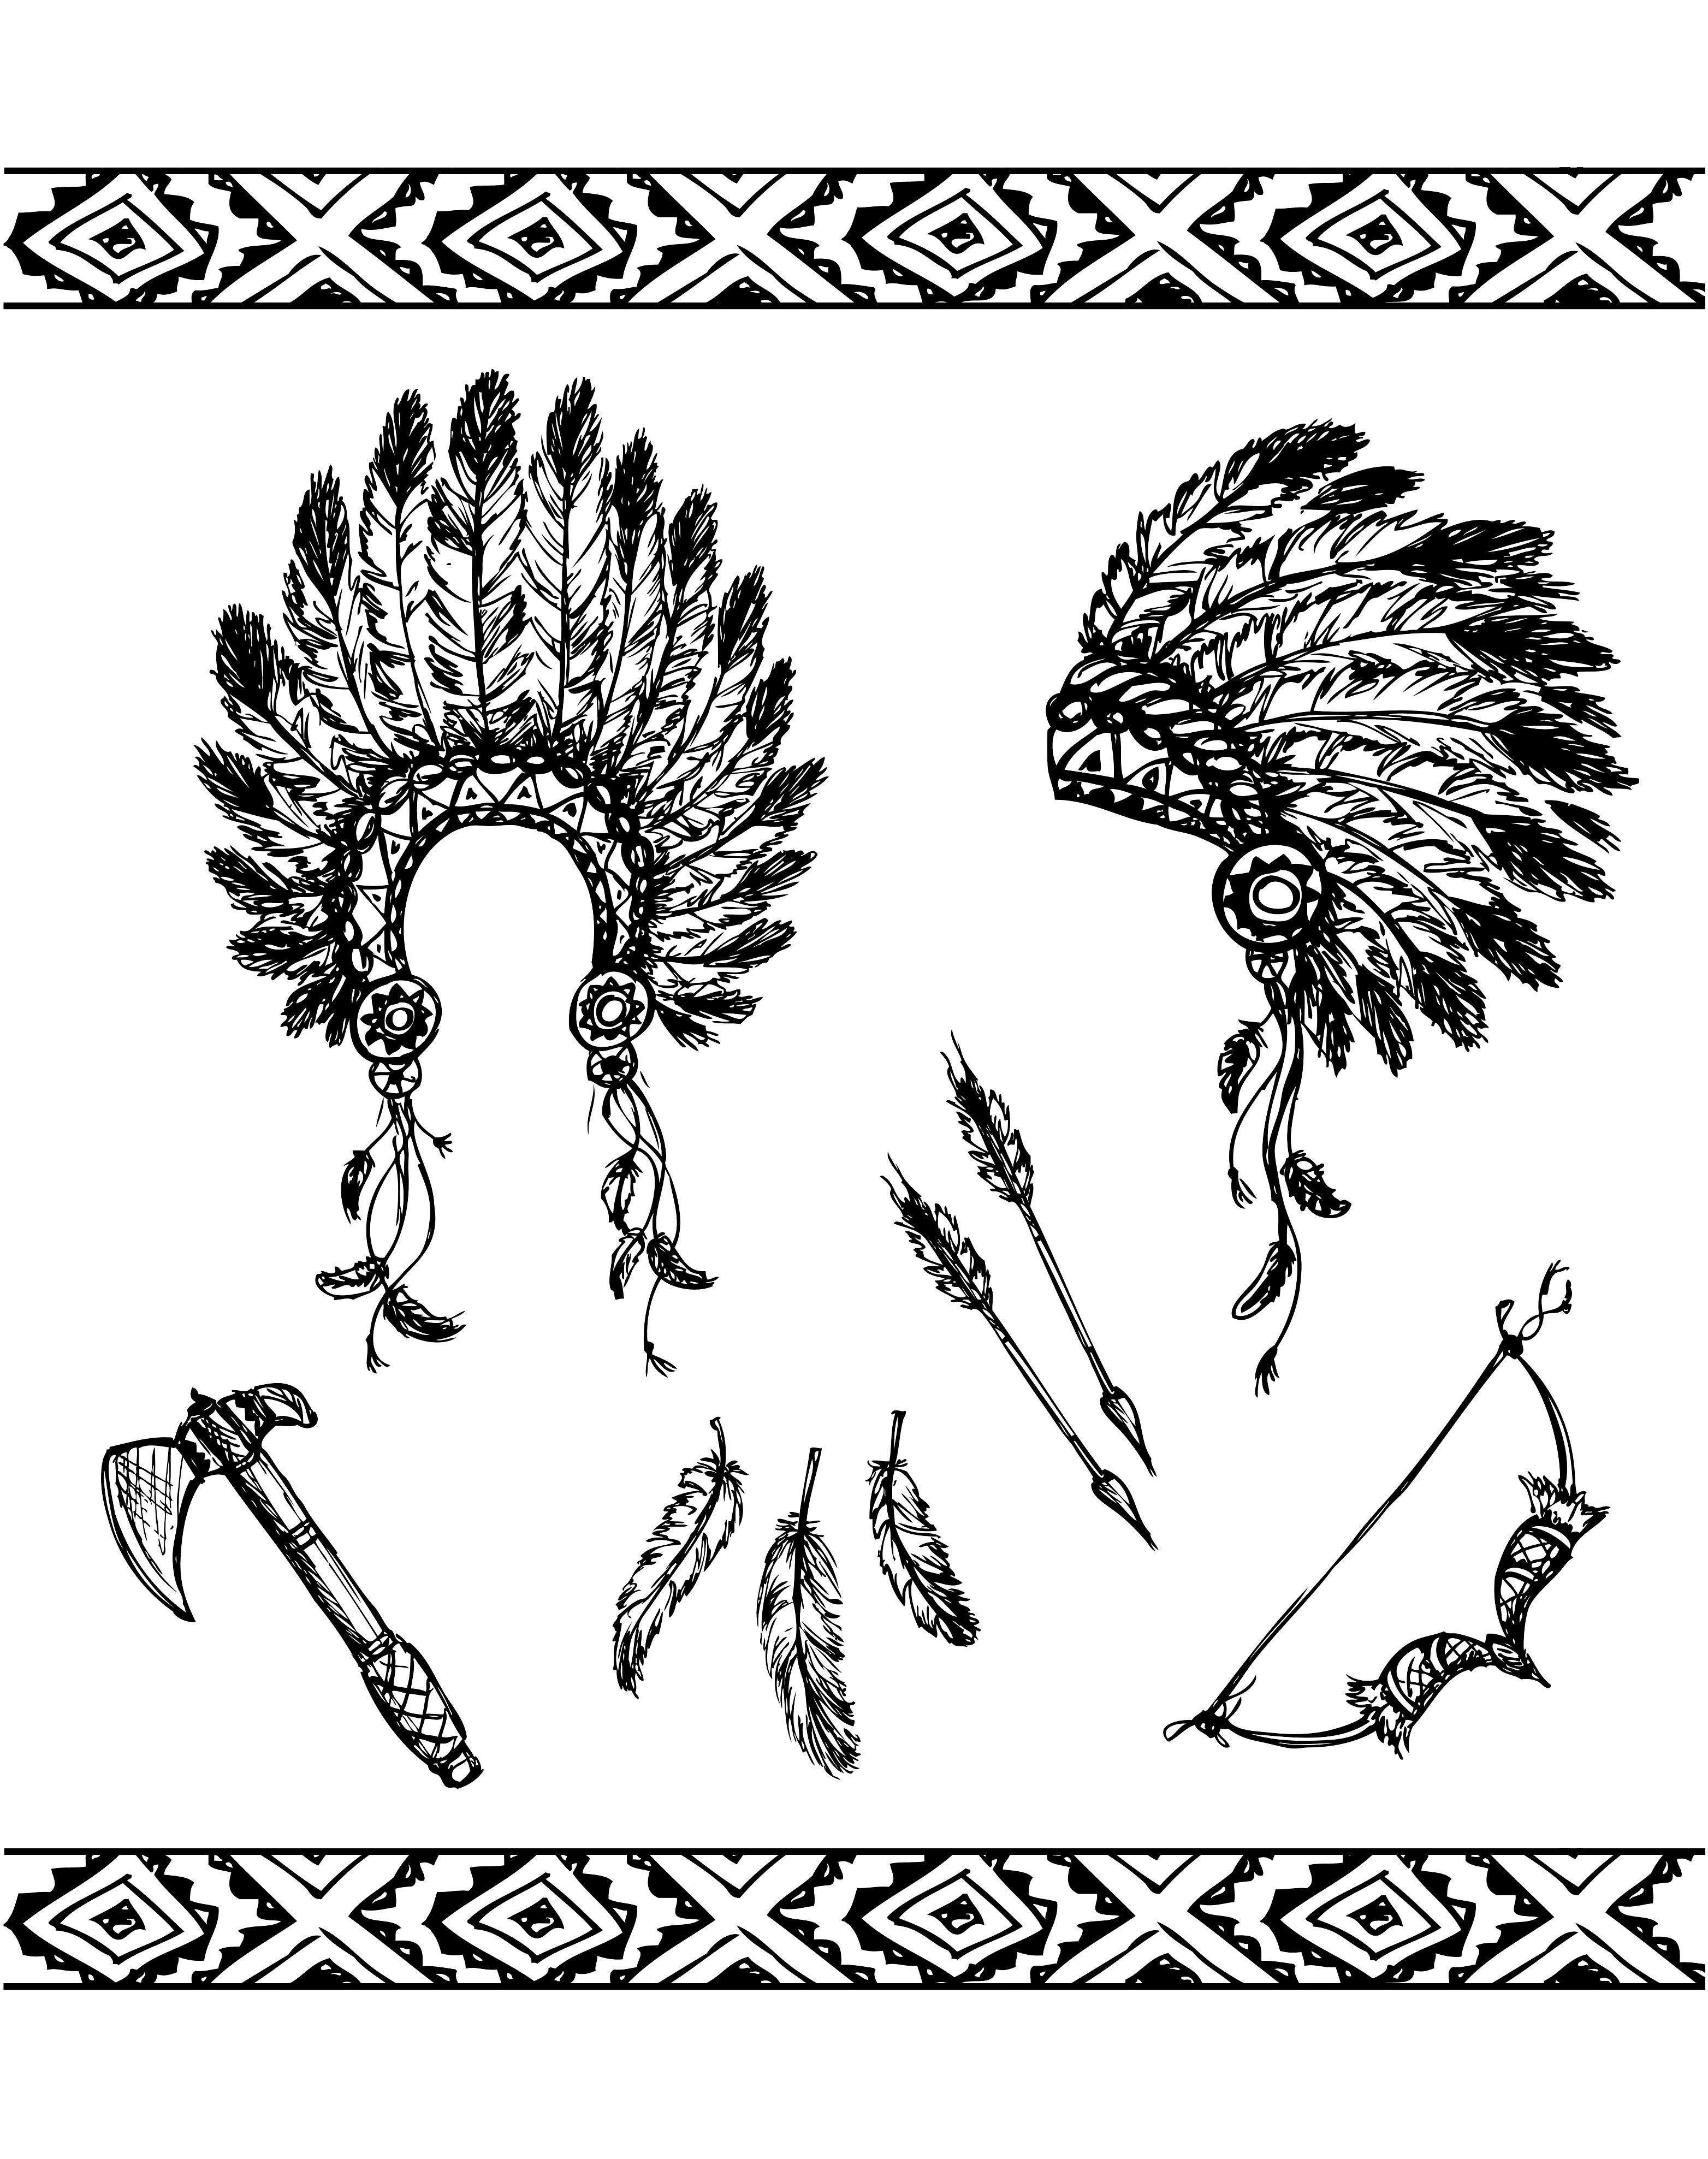 native american symbols thesymbolsnet - HD3128×3954